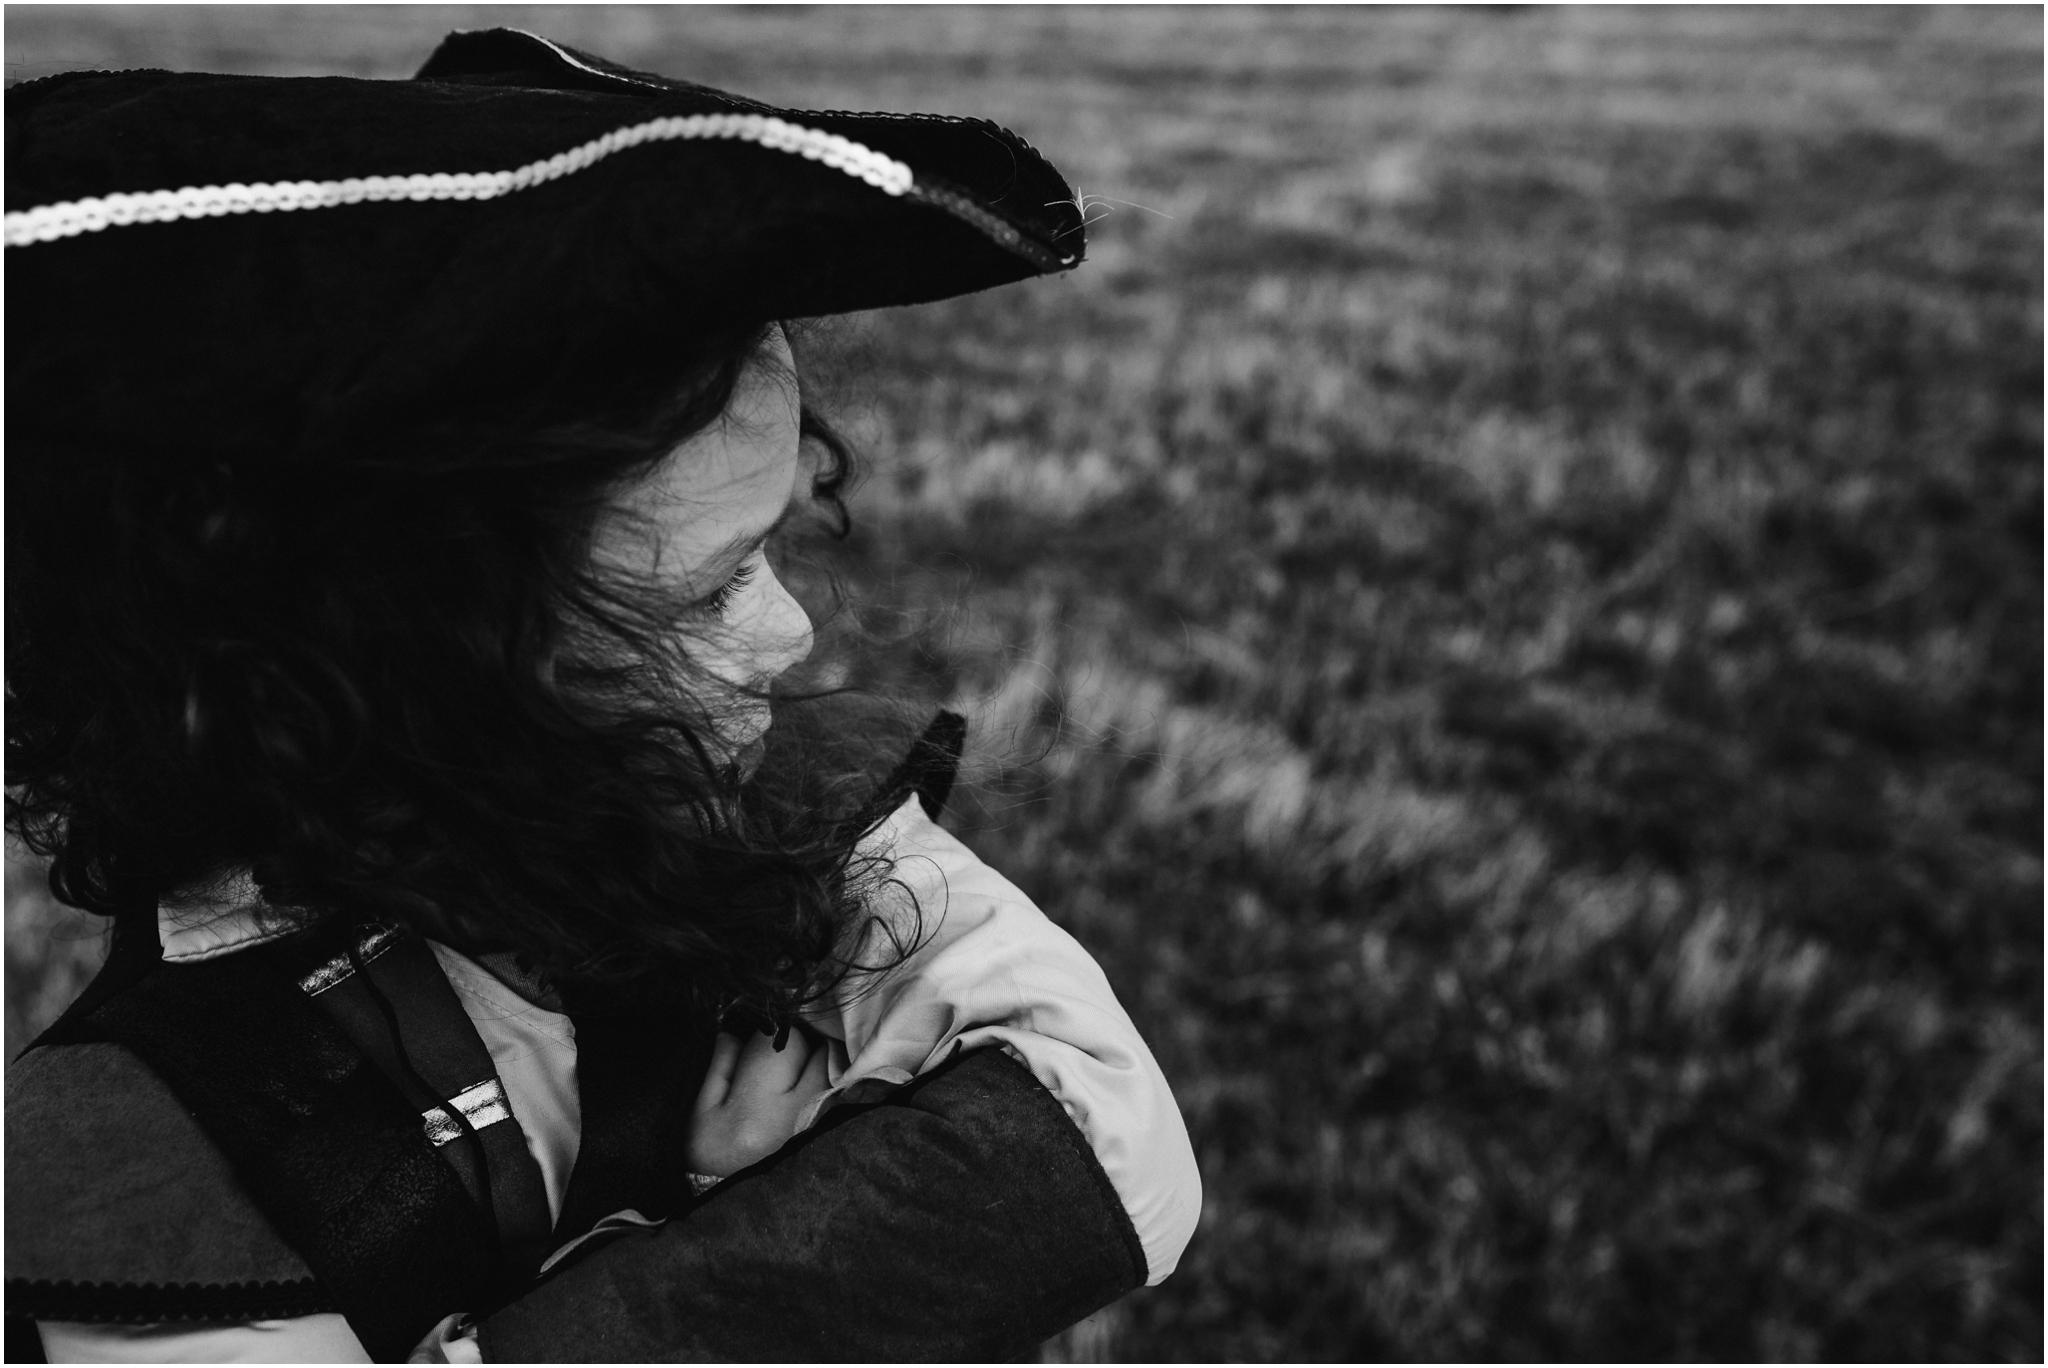 Edmonton Photographer - Lifestyle Documentary Adventure Photography - Pirate Costume - Pirate Hat